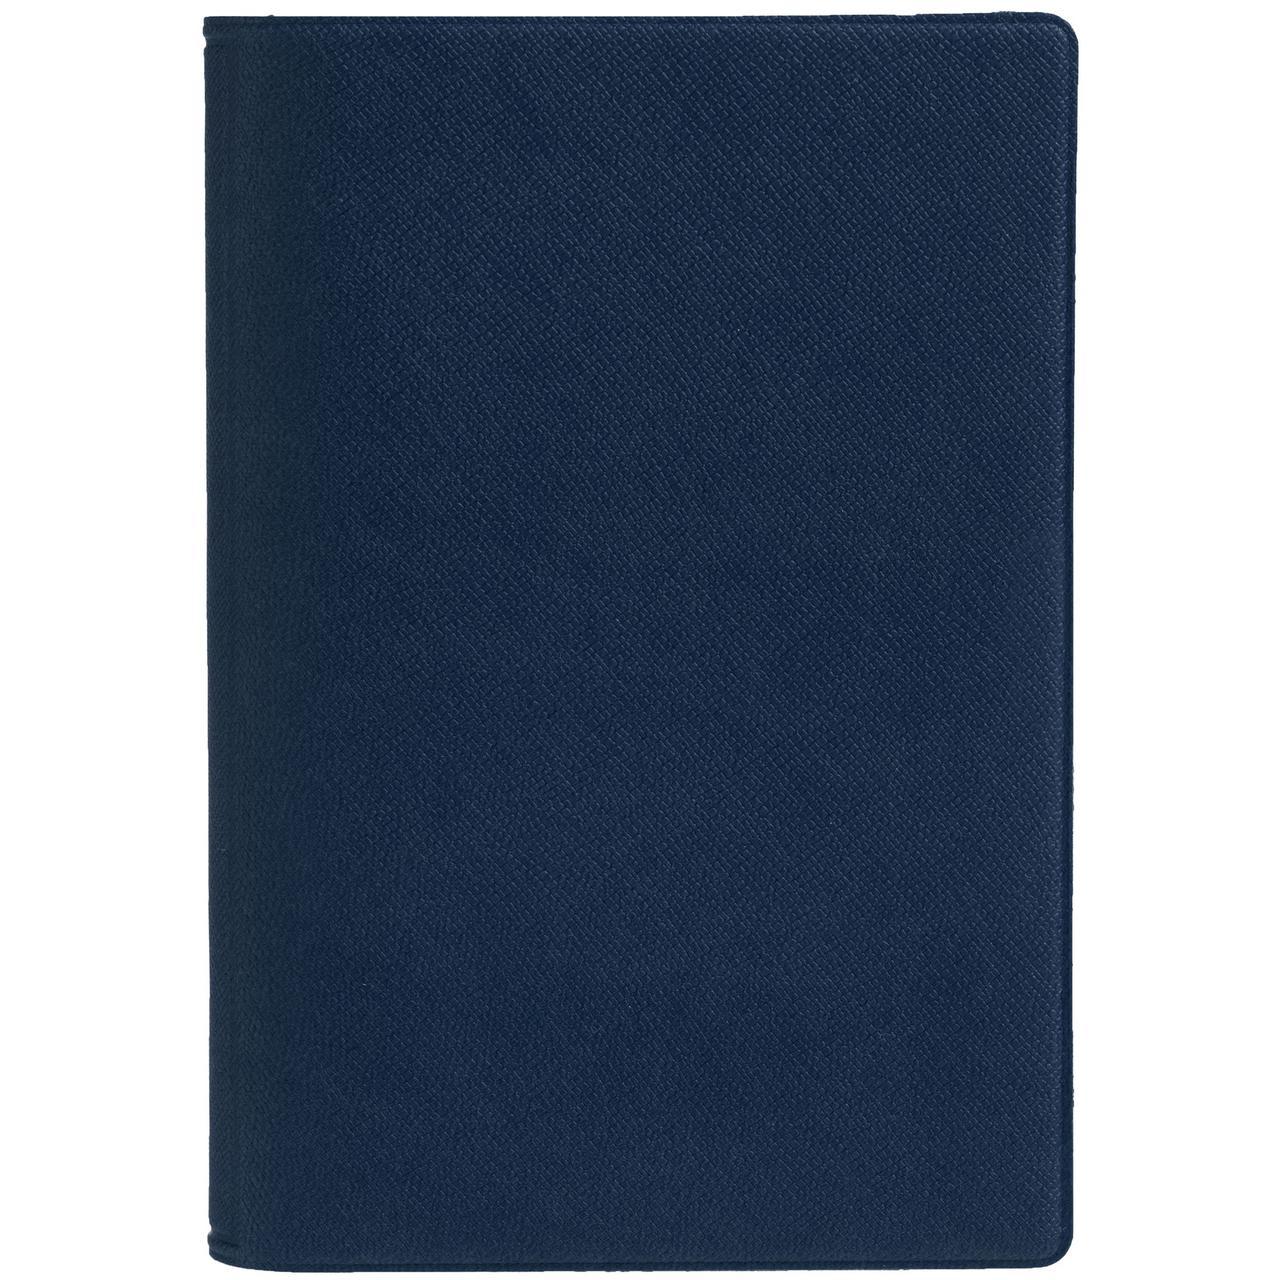 Обложка для паспорта Devon, синяя (артикул 10266.40)